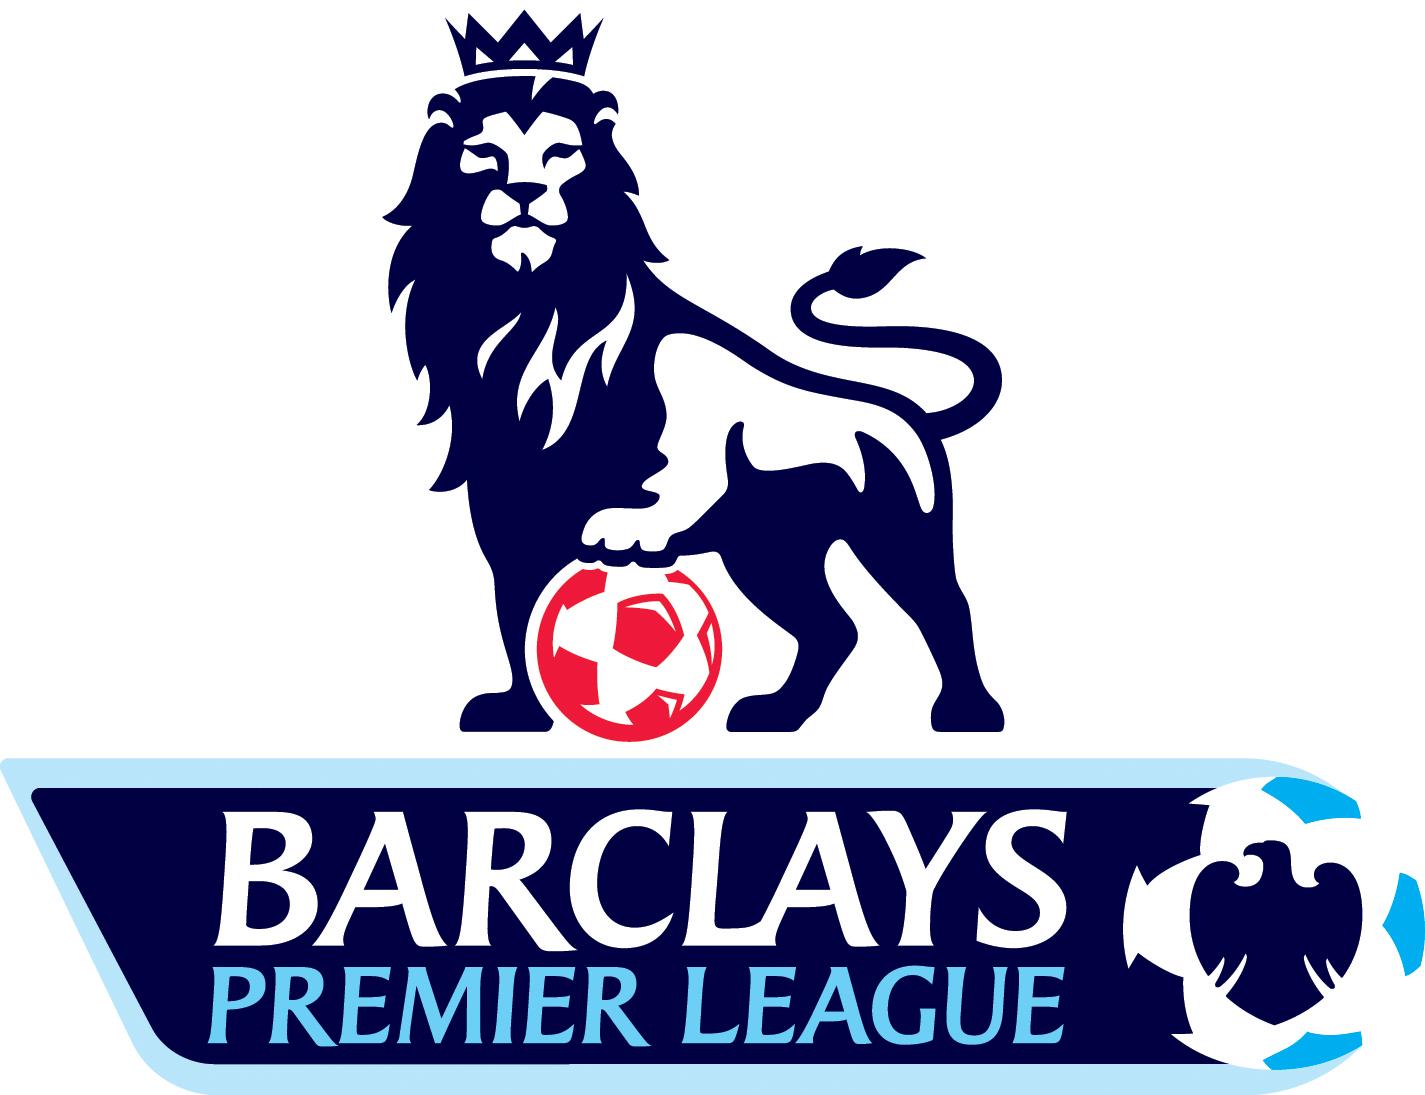 sportswithhenry.files.wordpress.com_2011_02_barclays-premier-league1